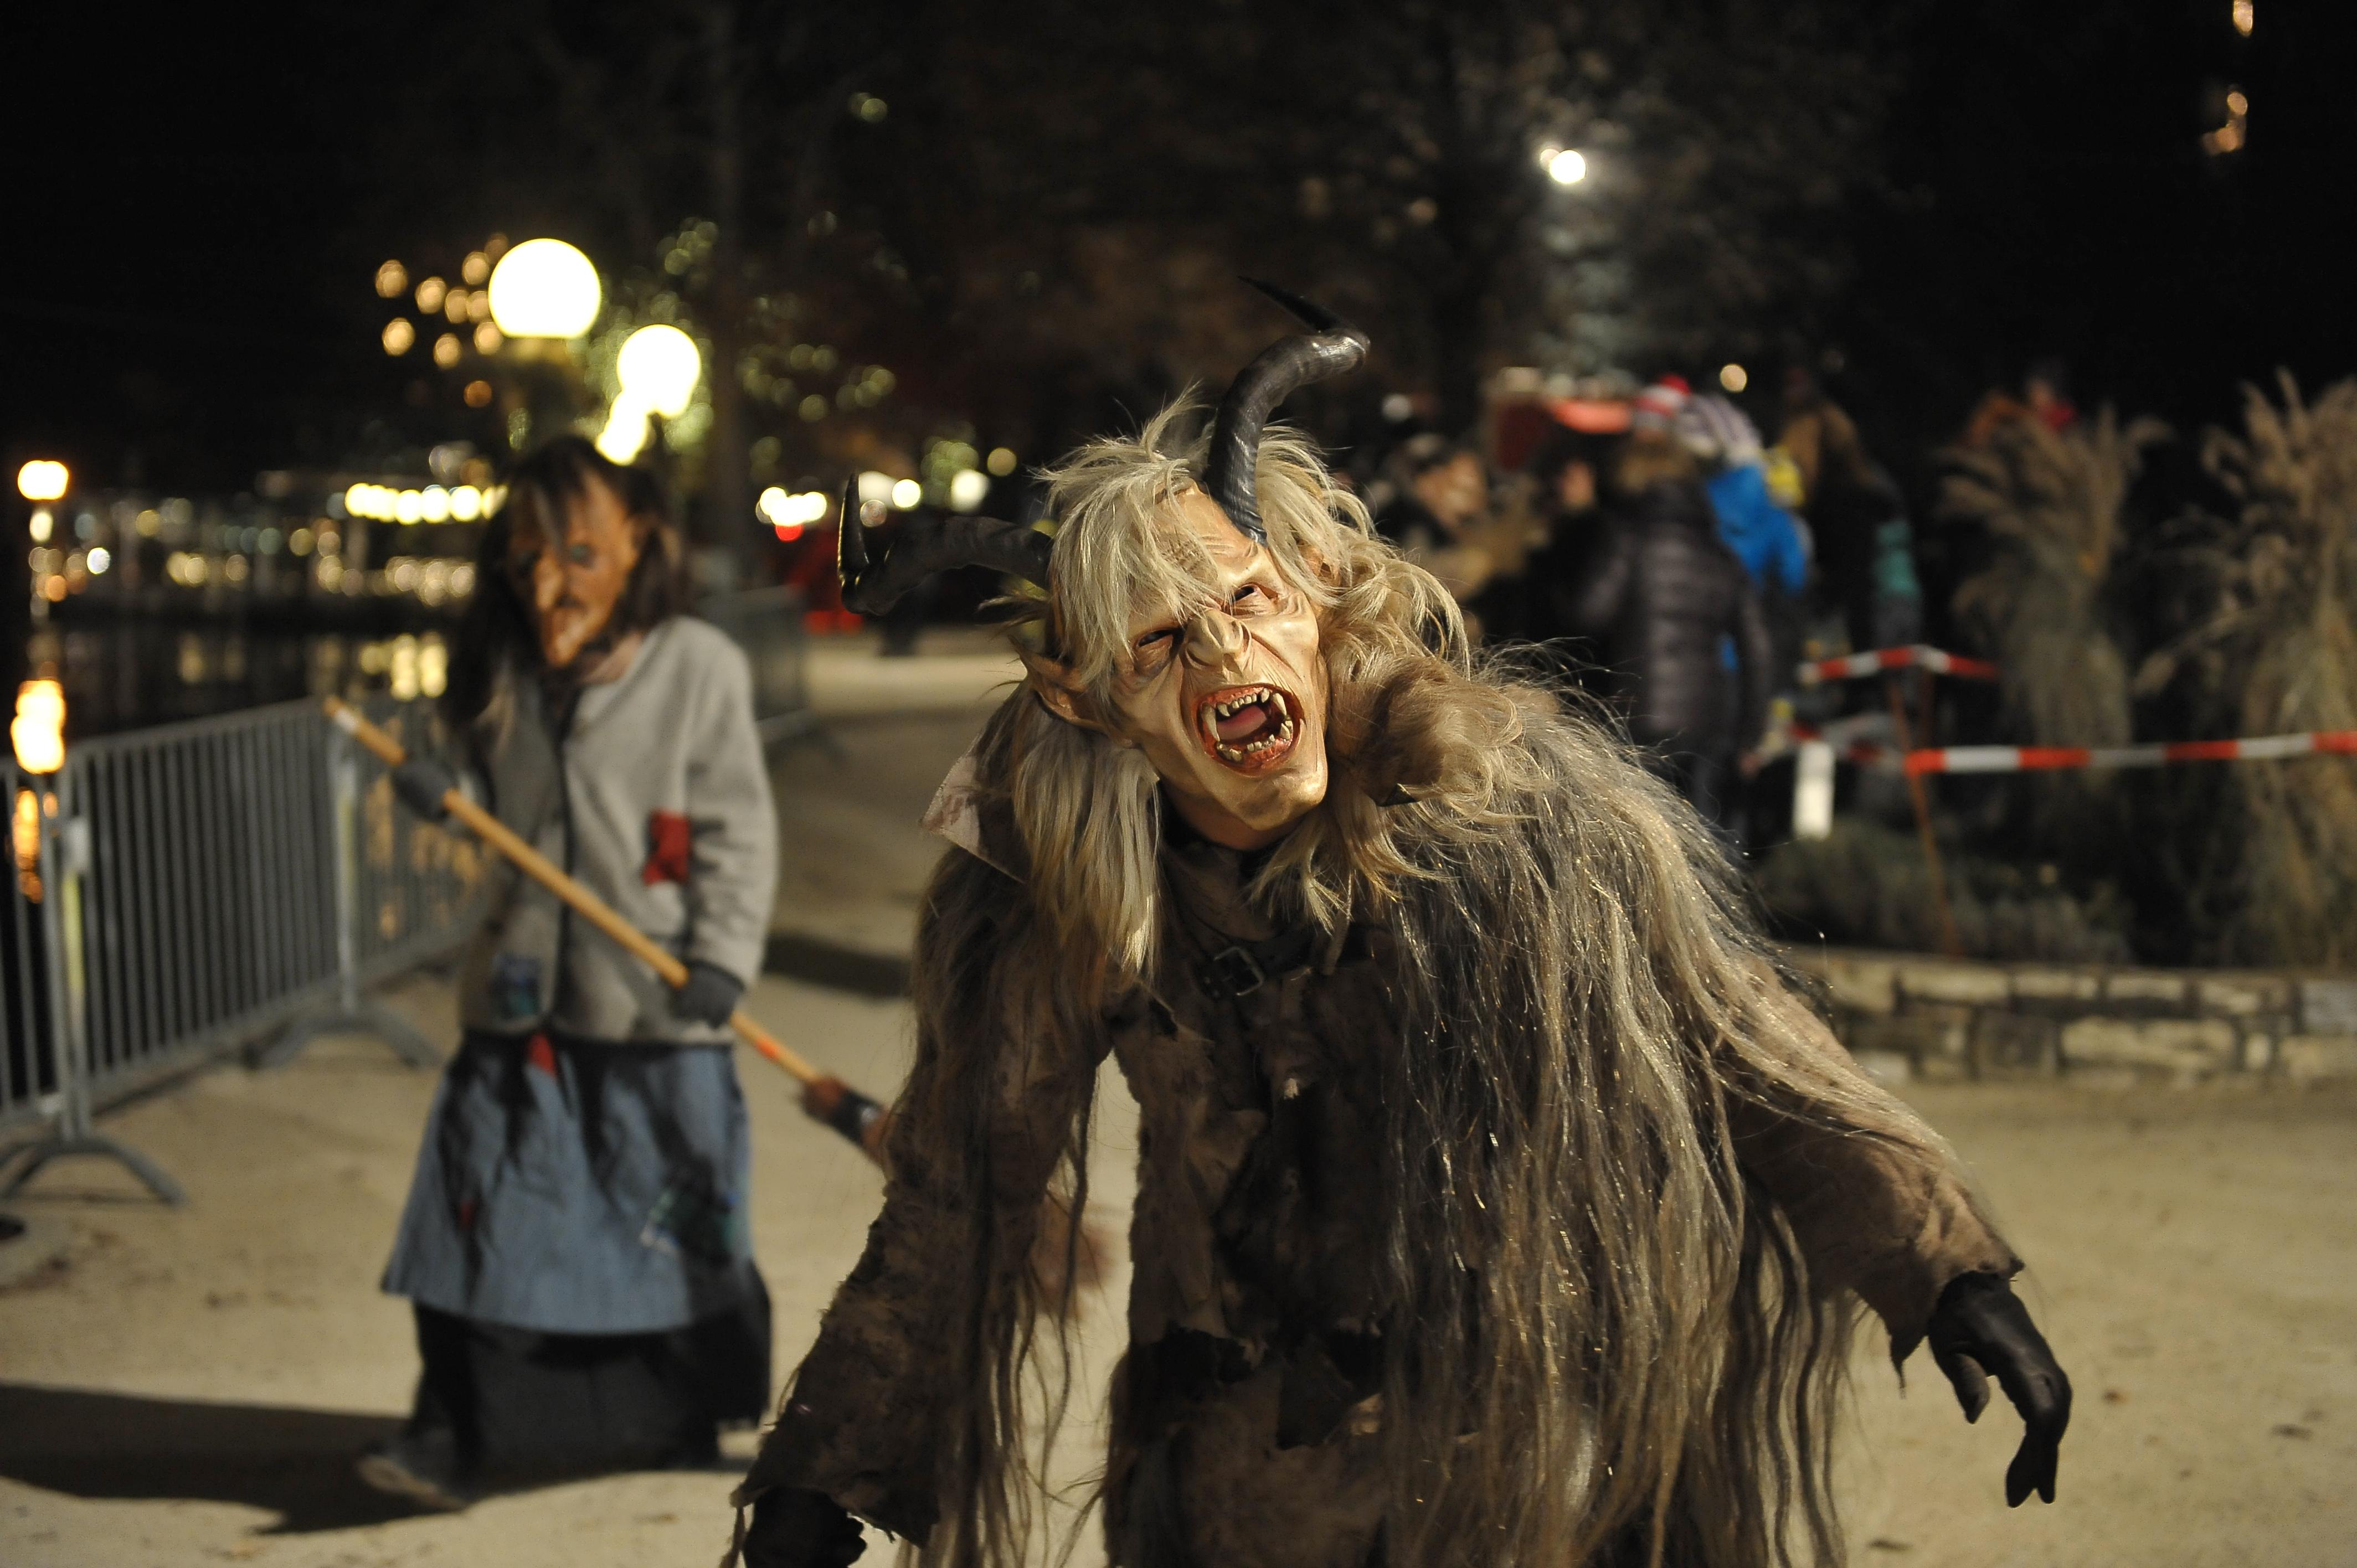 Halloween Costume Parade by Johann Jaritz